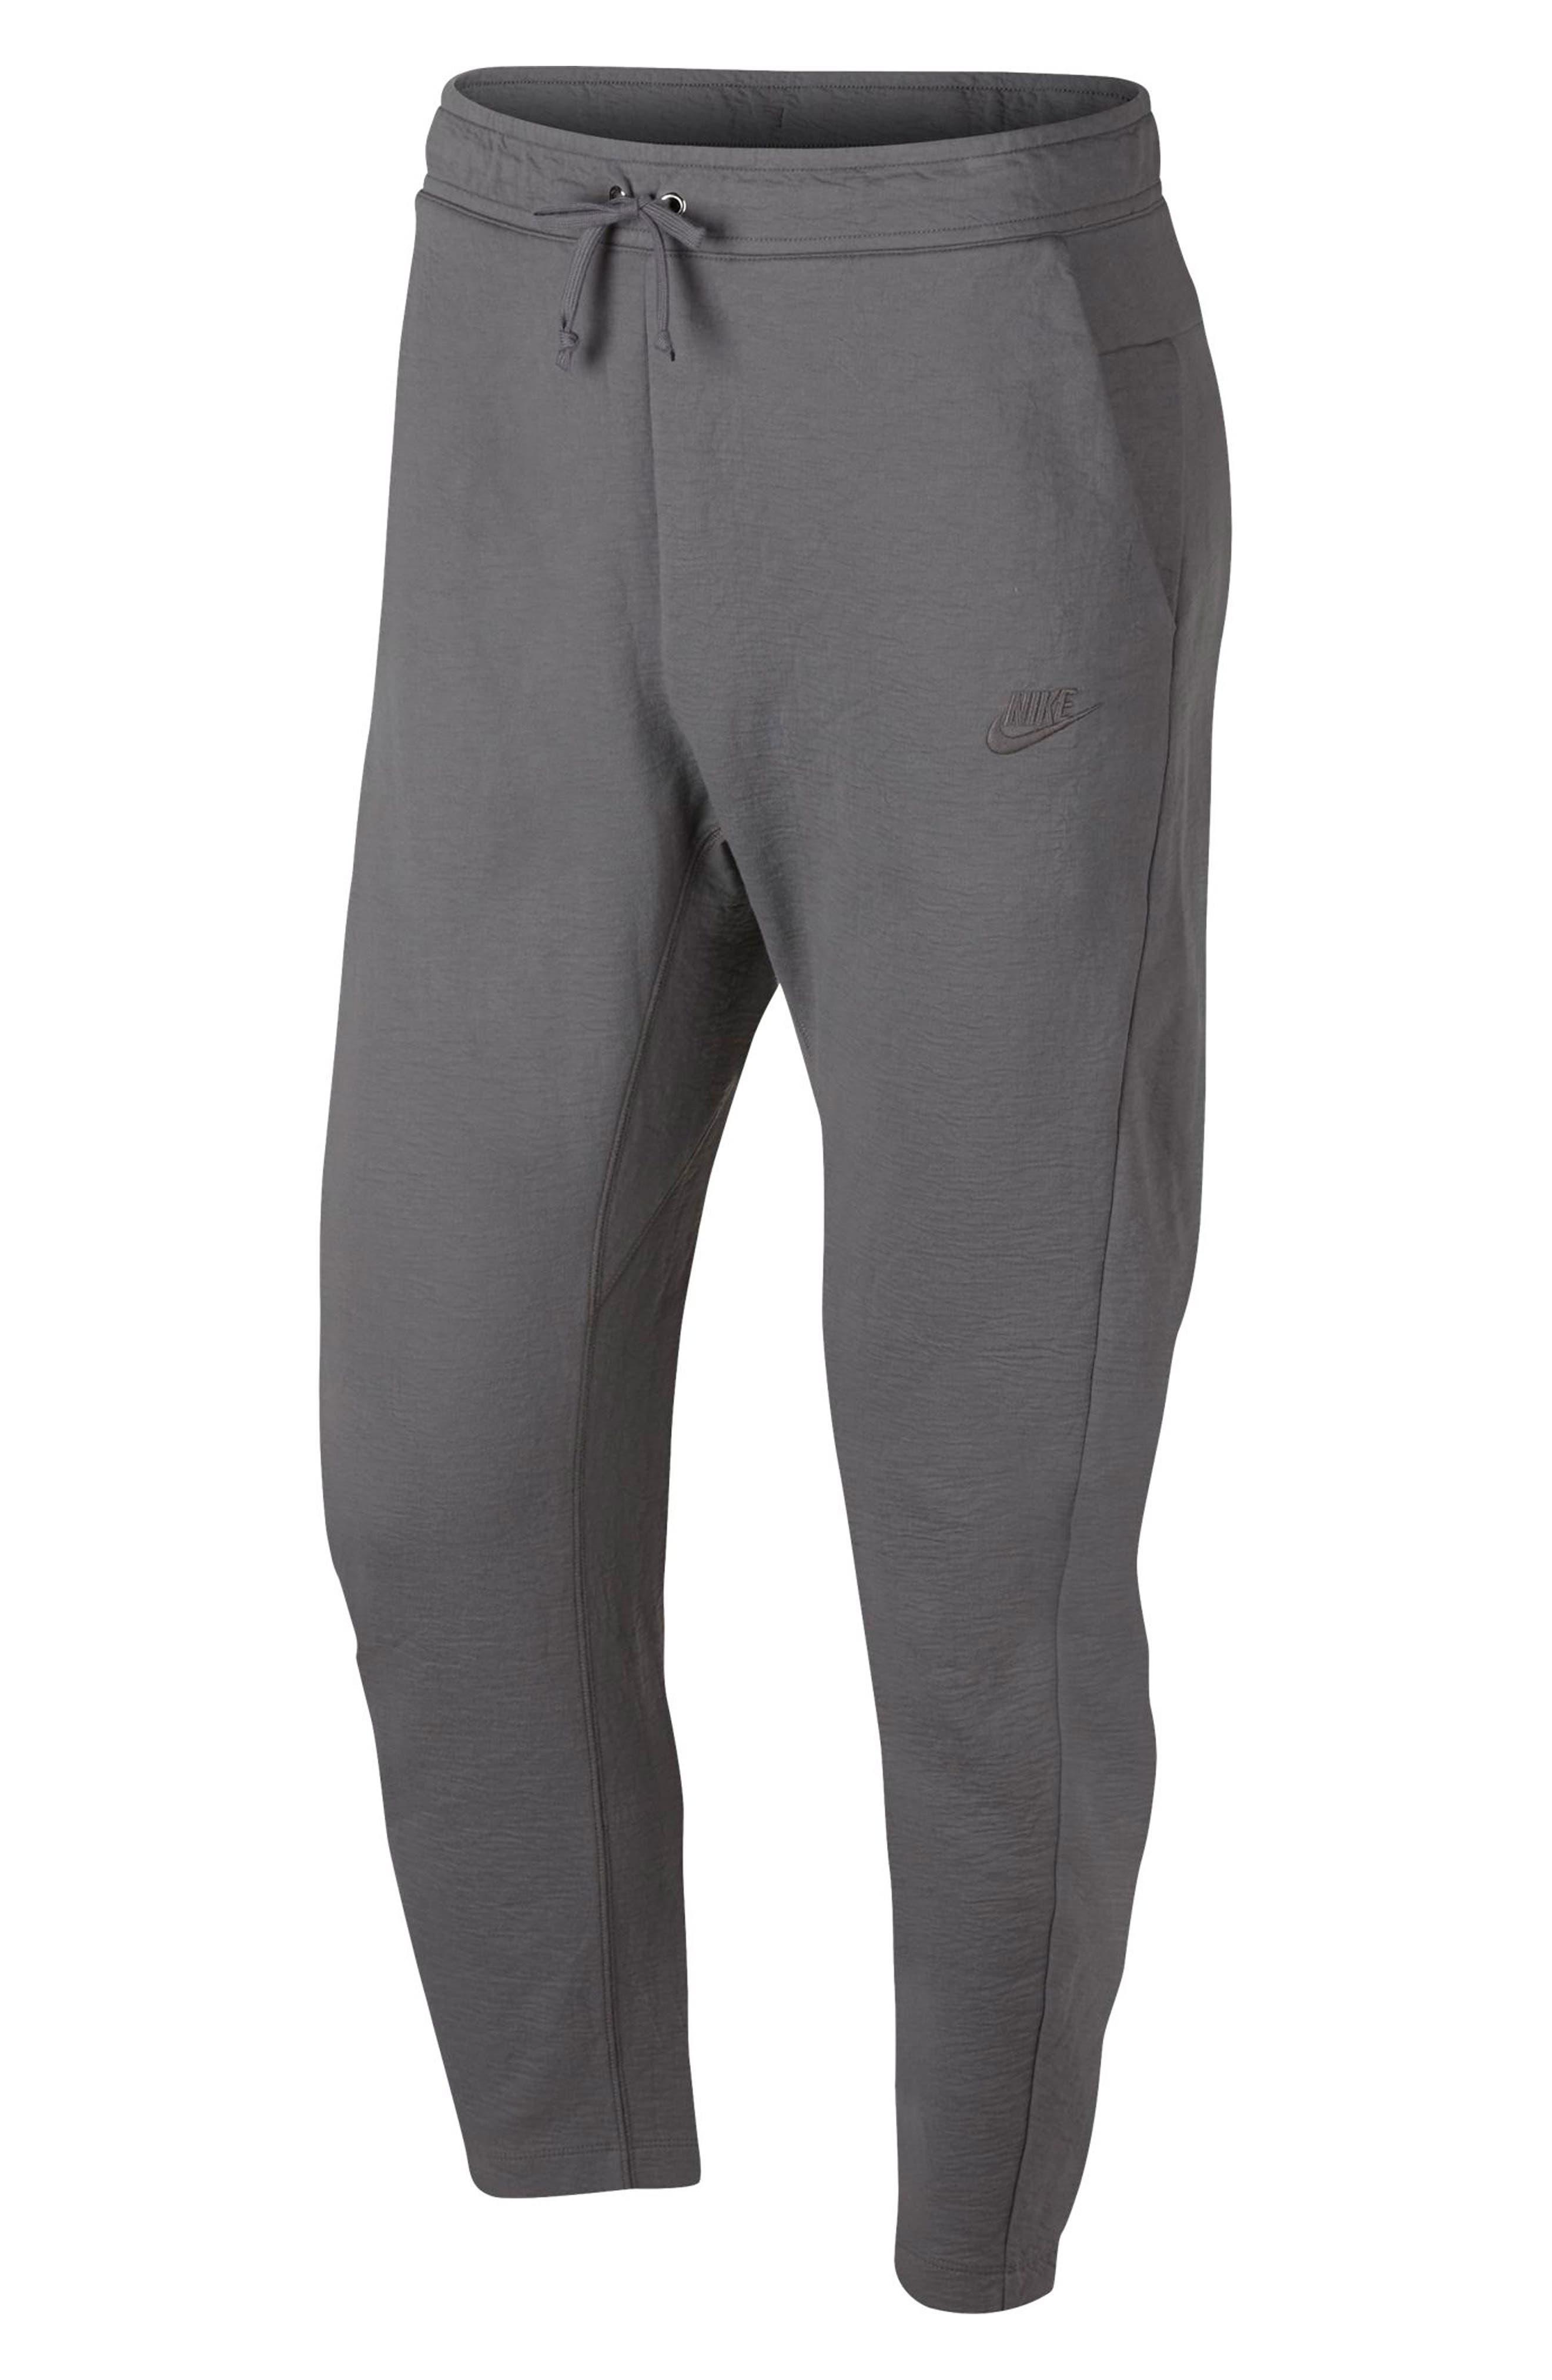 Men's Nike NSW Tech Jersey Sweatpants